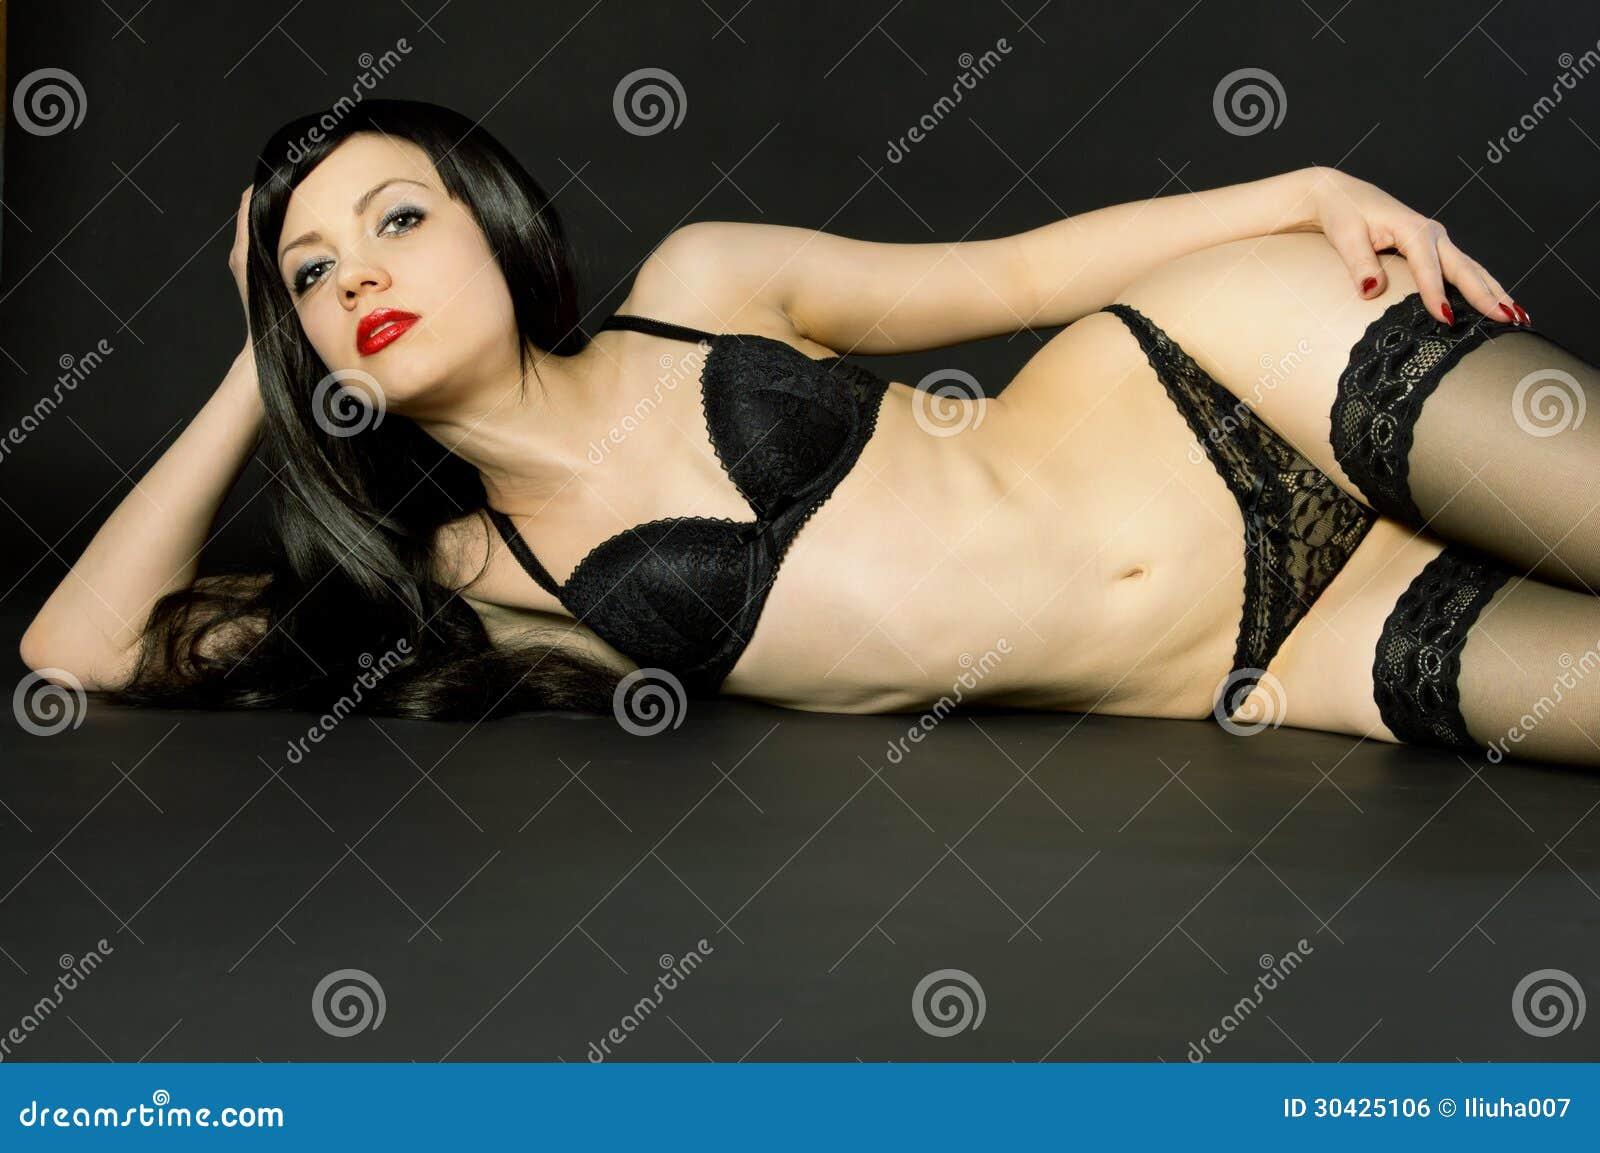 naked ebony women in panties